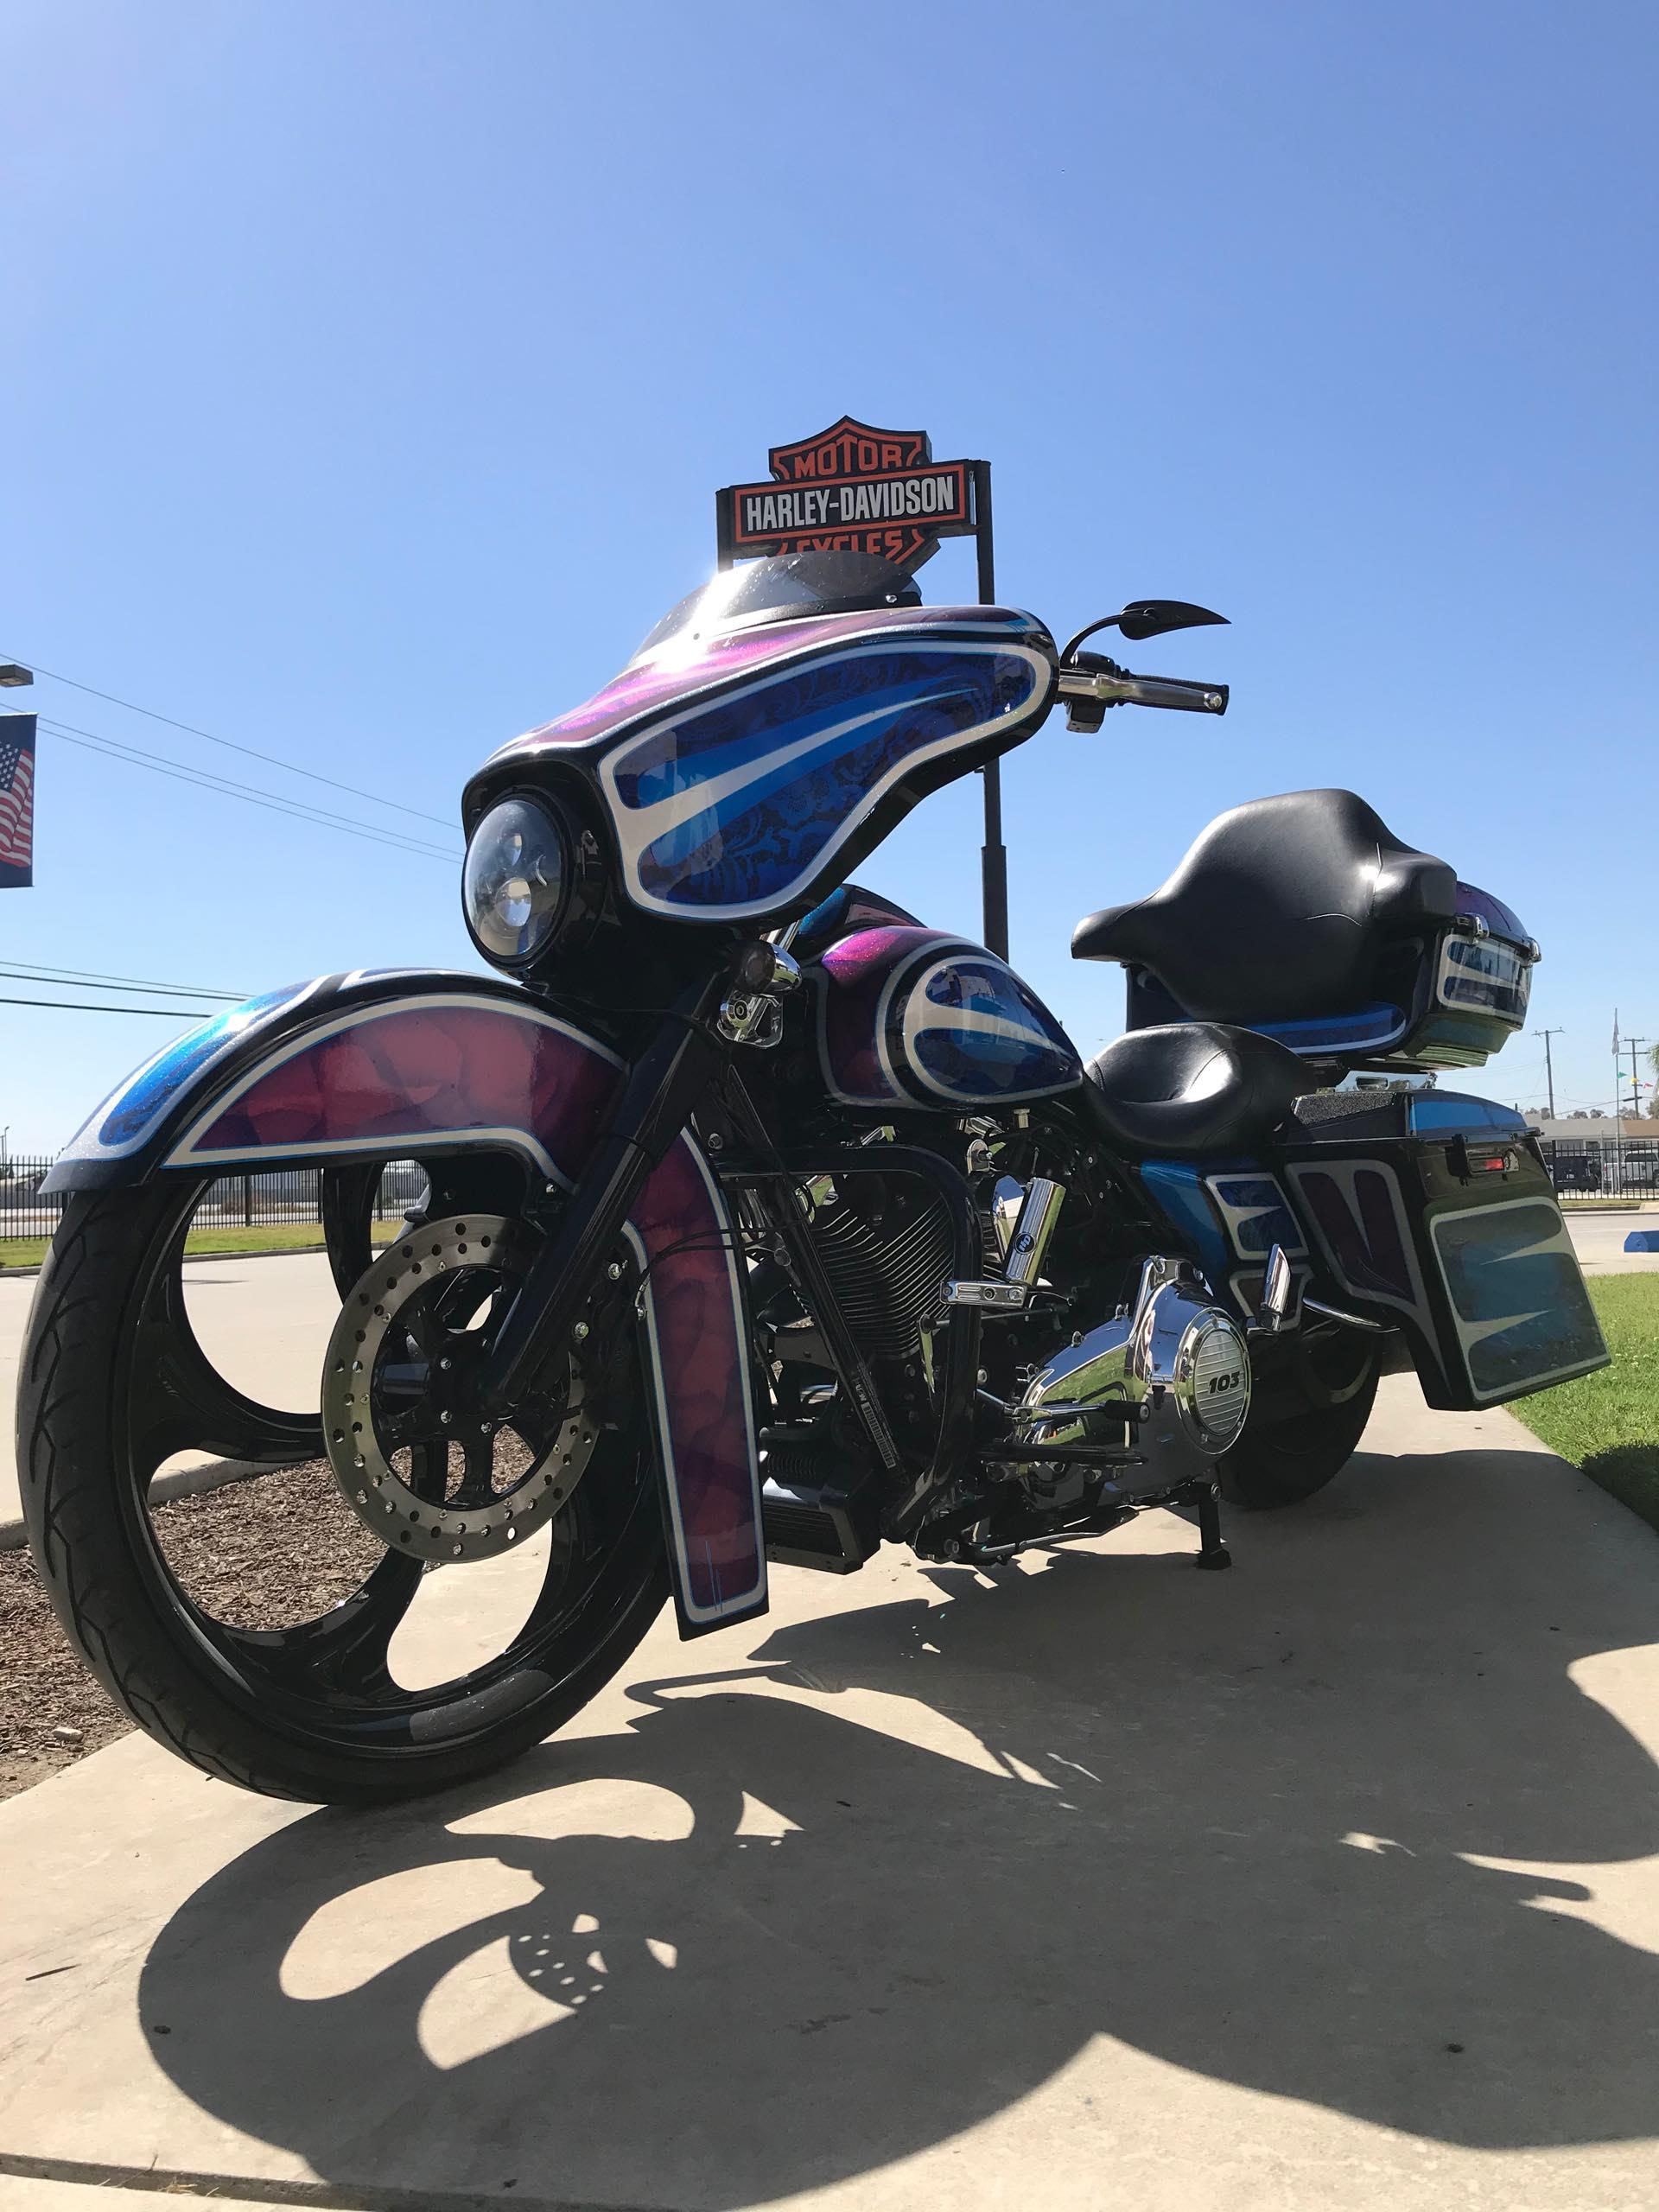 2012 Harley-Davidson Street Glide Base at Visalia Harley-Davidson